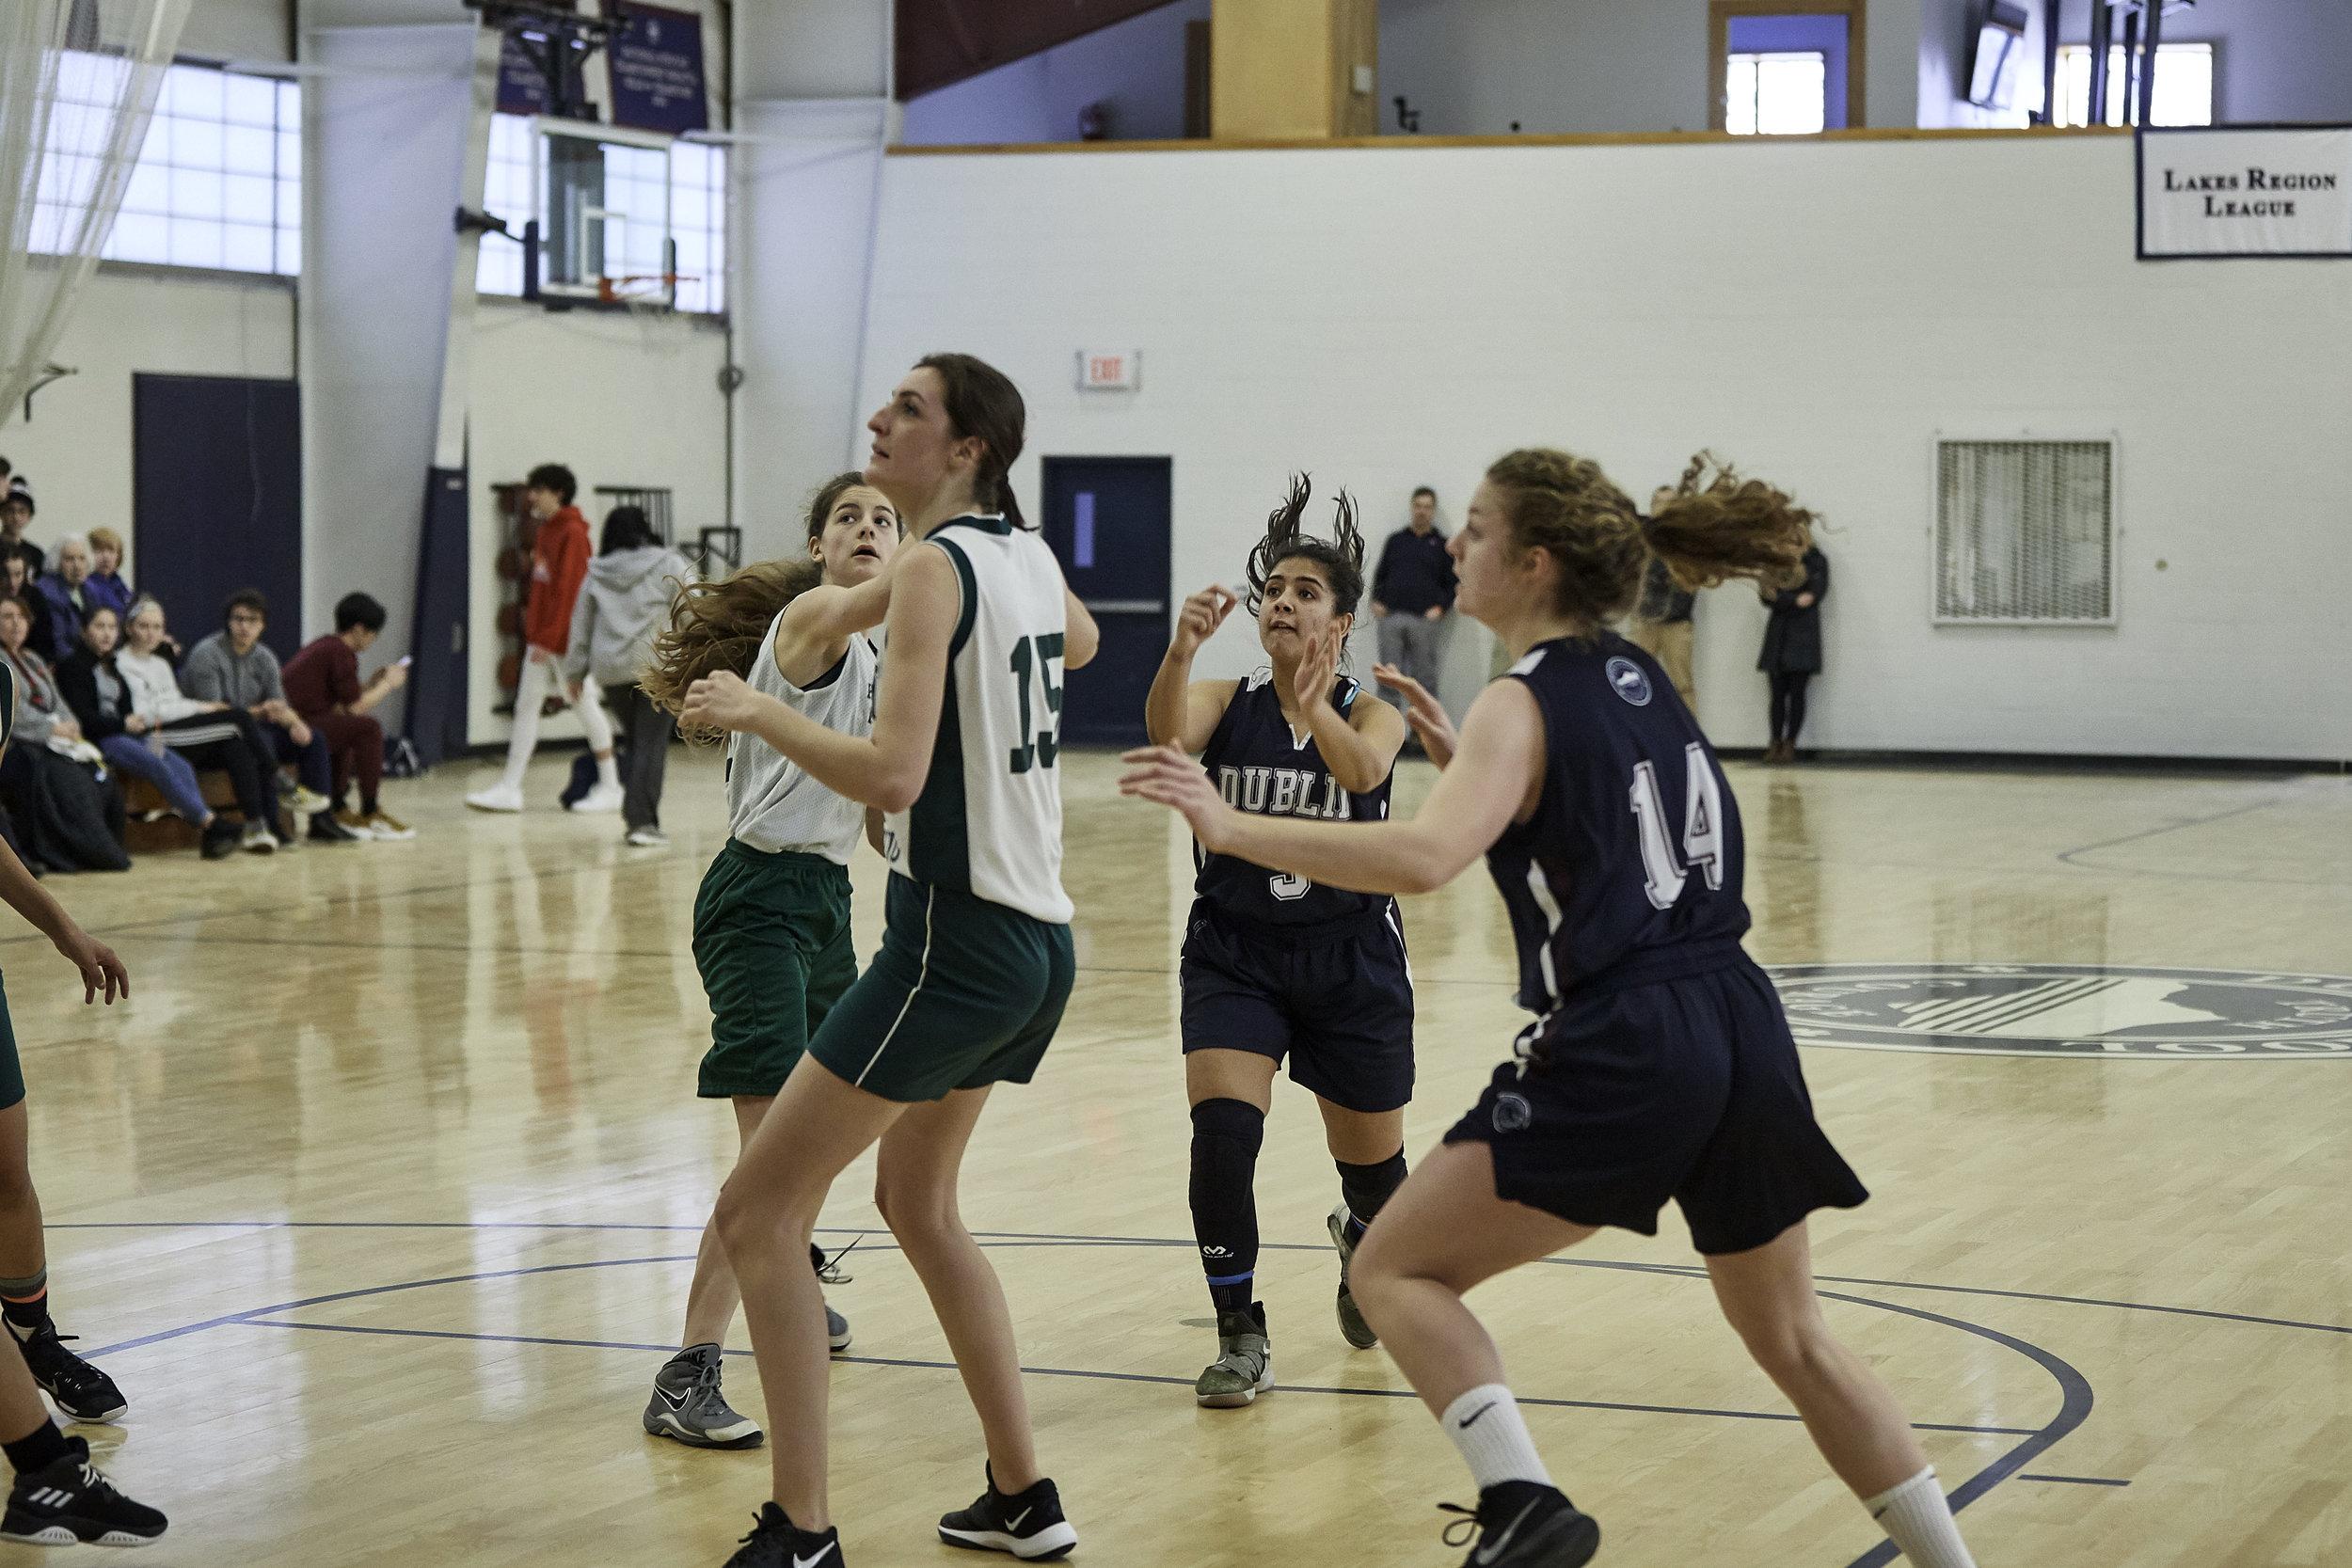 Basketball vs High Mowing School, February 2, 2019 - 166326.jpg